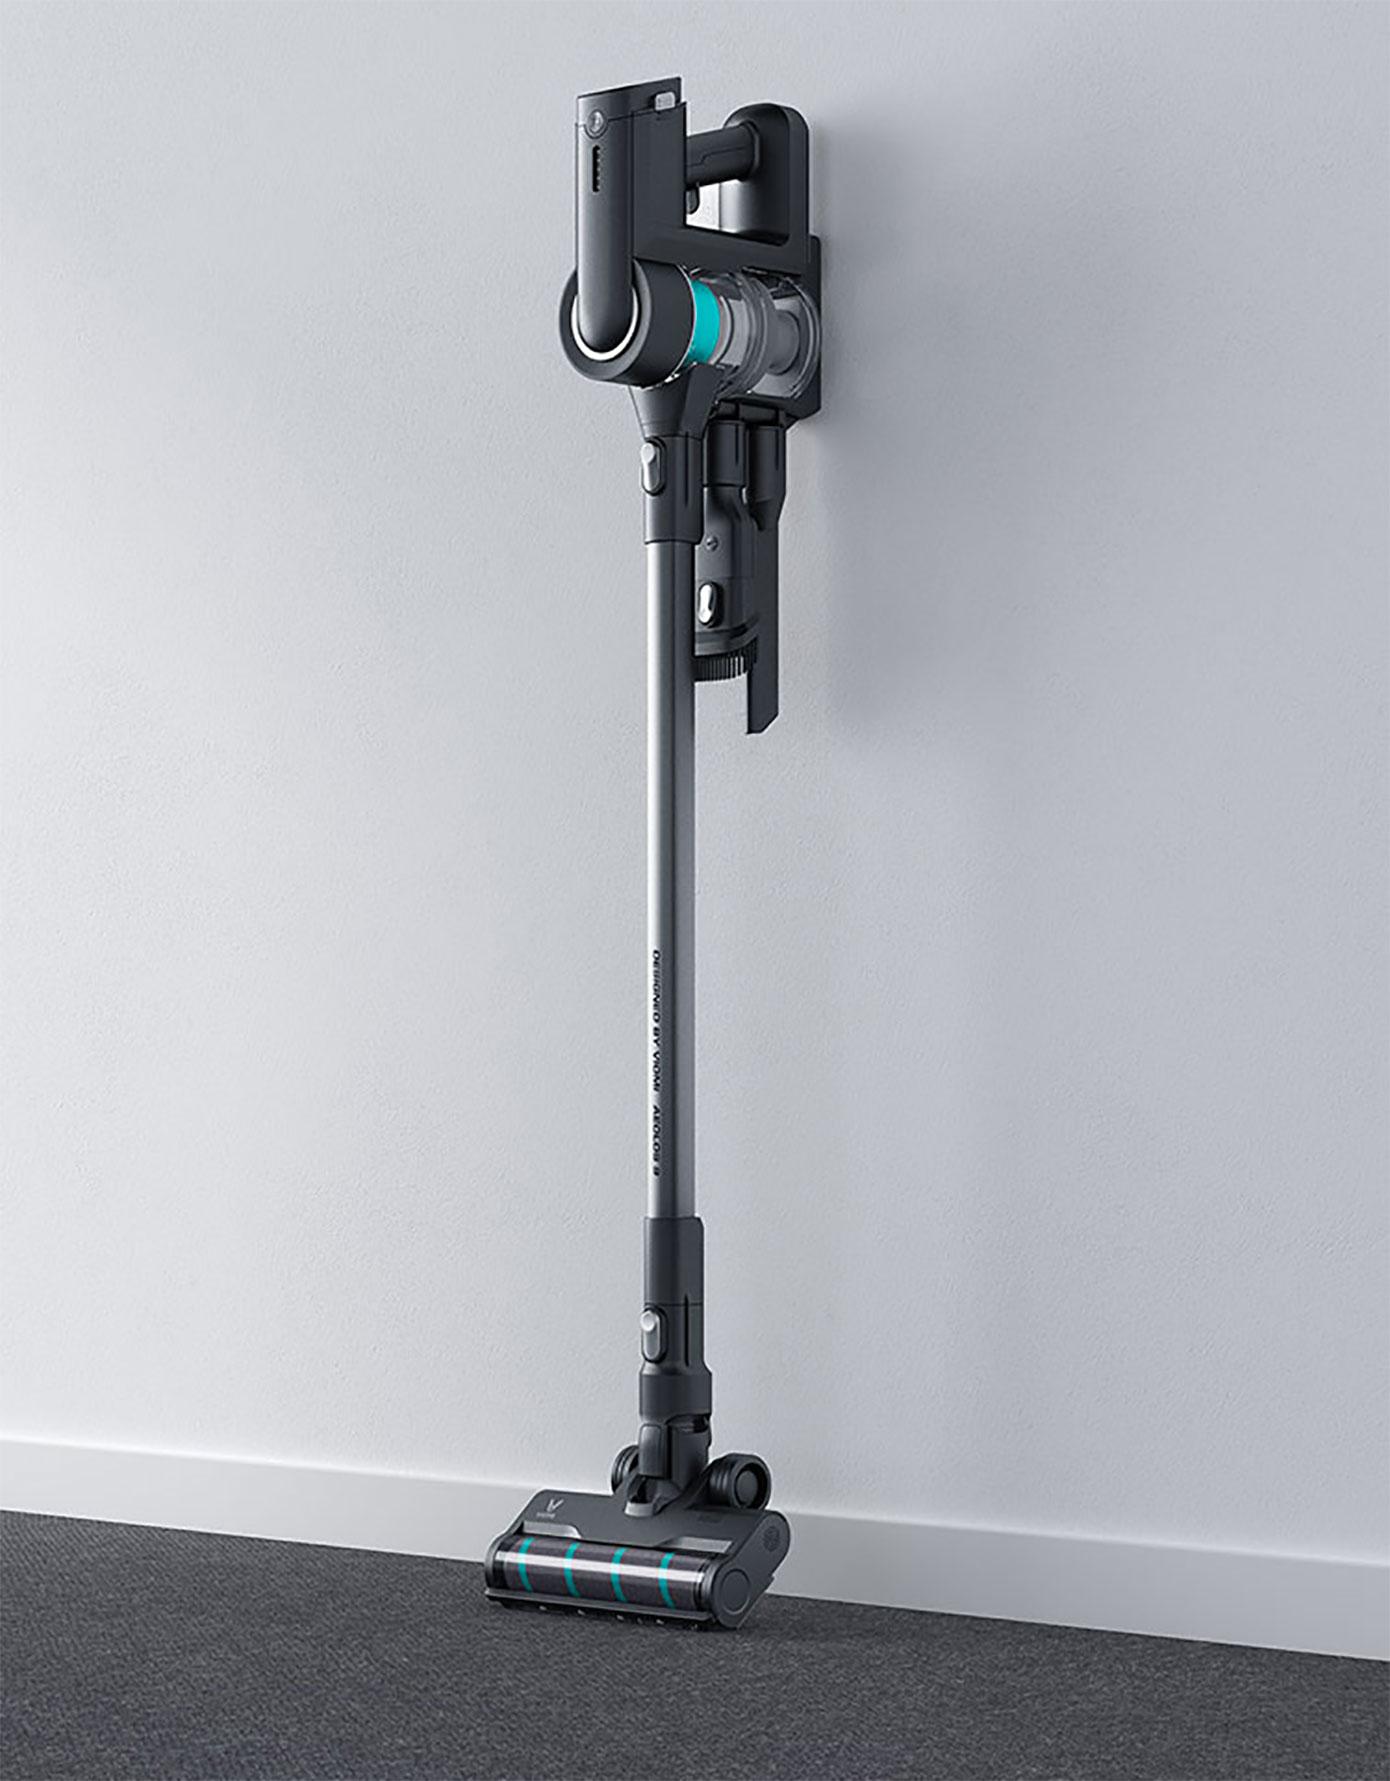 Opisanie Besprovodnoj Ruchnoj Pylesos Viomi A9 Hanheld Wireless Vacuum Cleaner Black 1